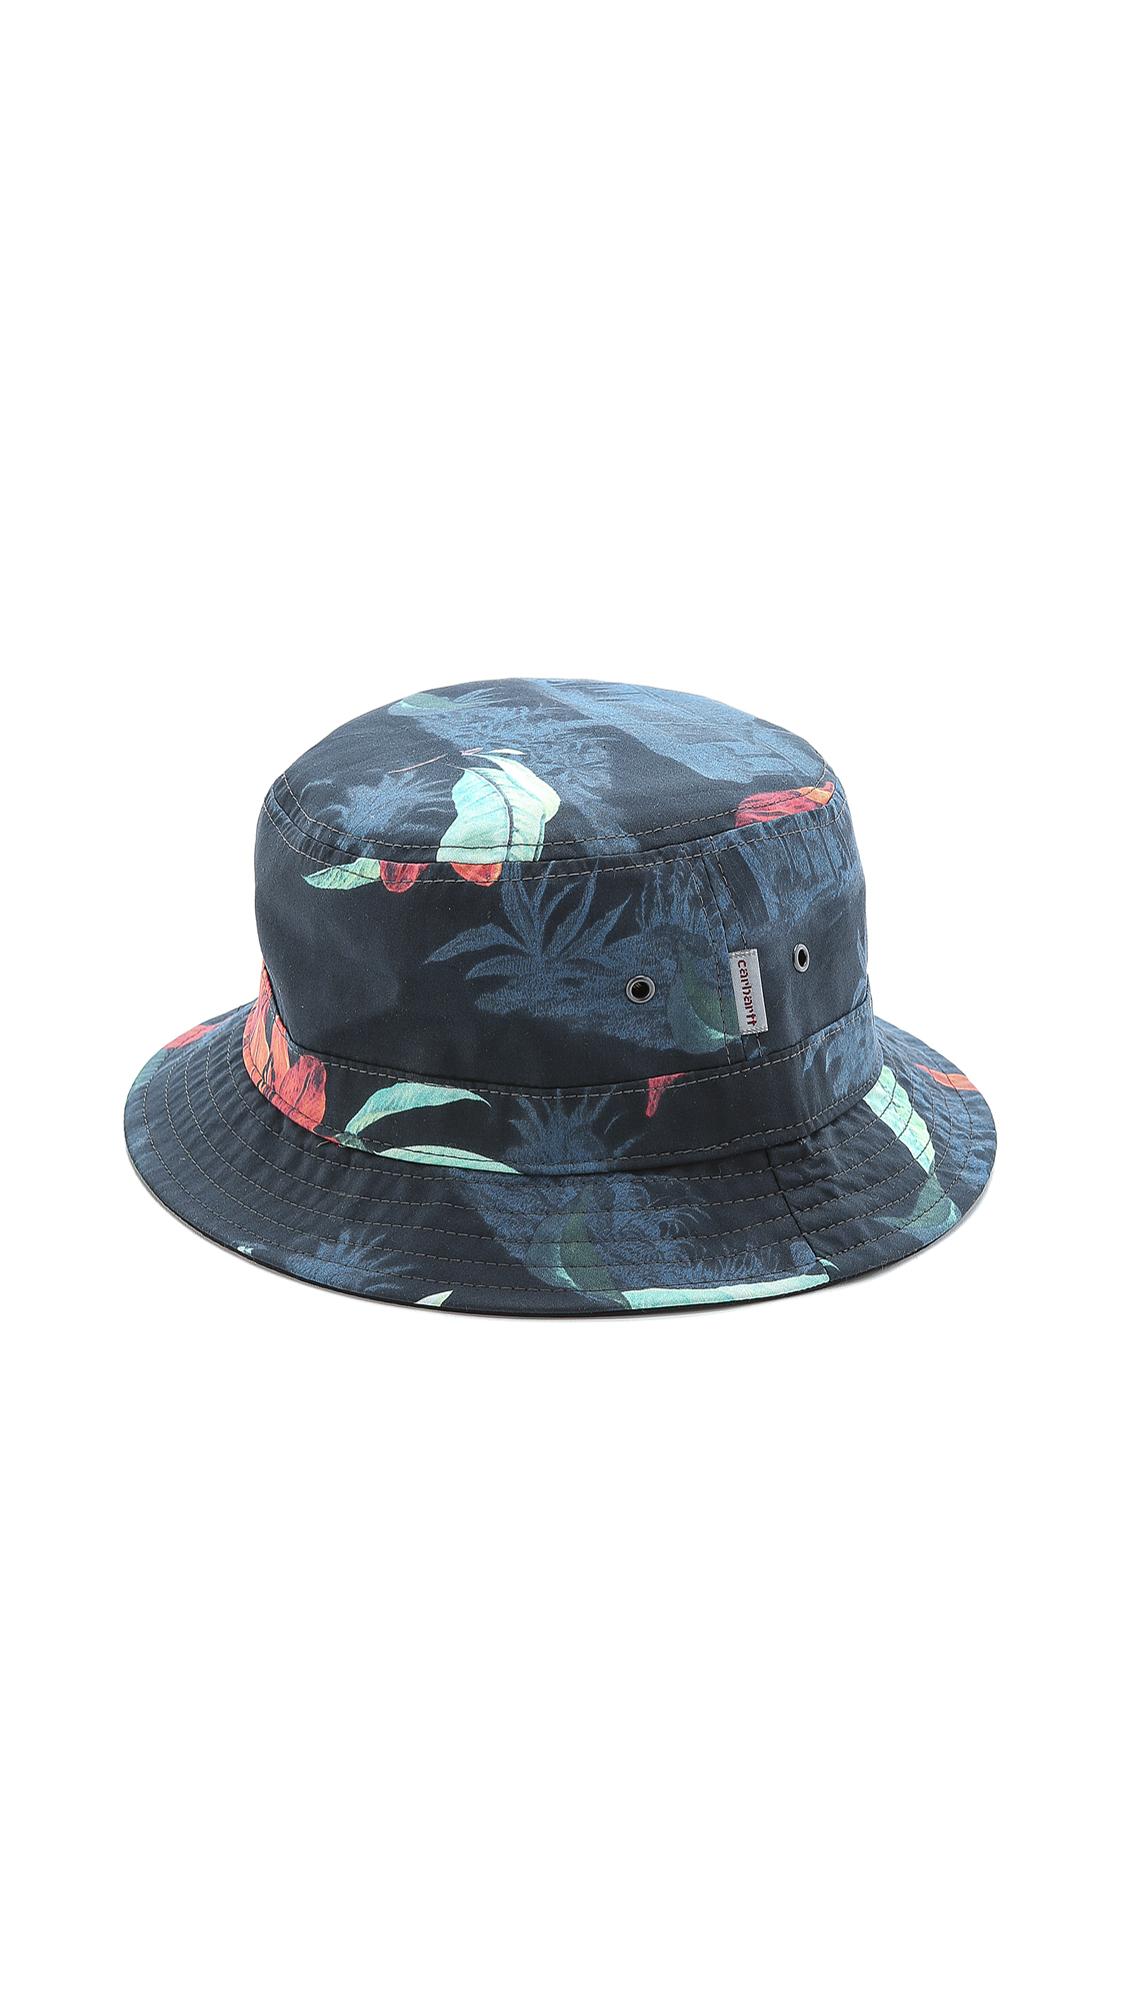 c7cde37c7fc ... italy carhartt wip reversible bucket hat in black for men lyst 85bda  29059 ...